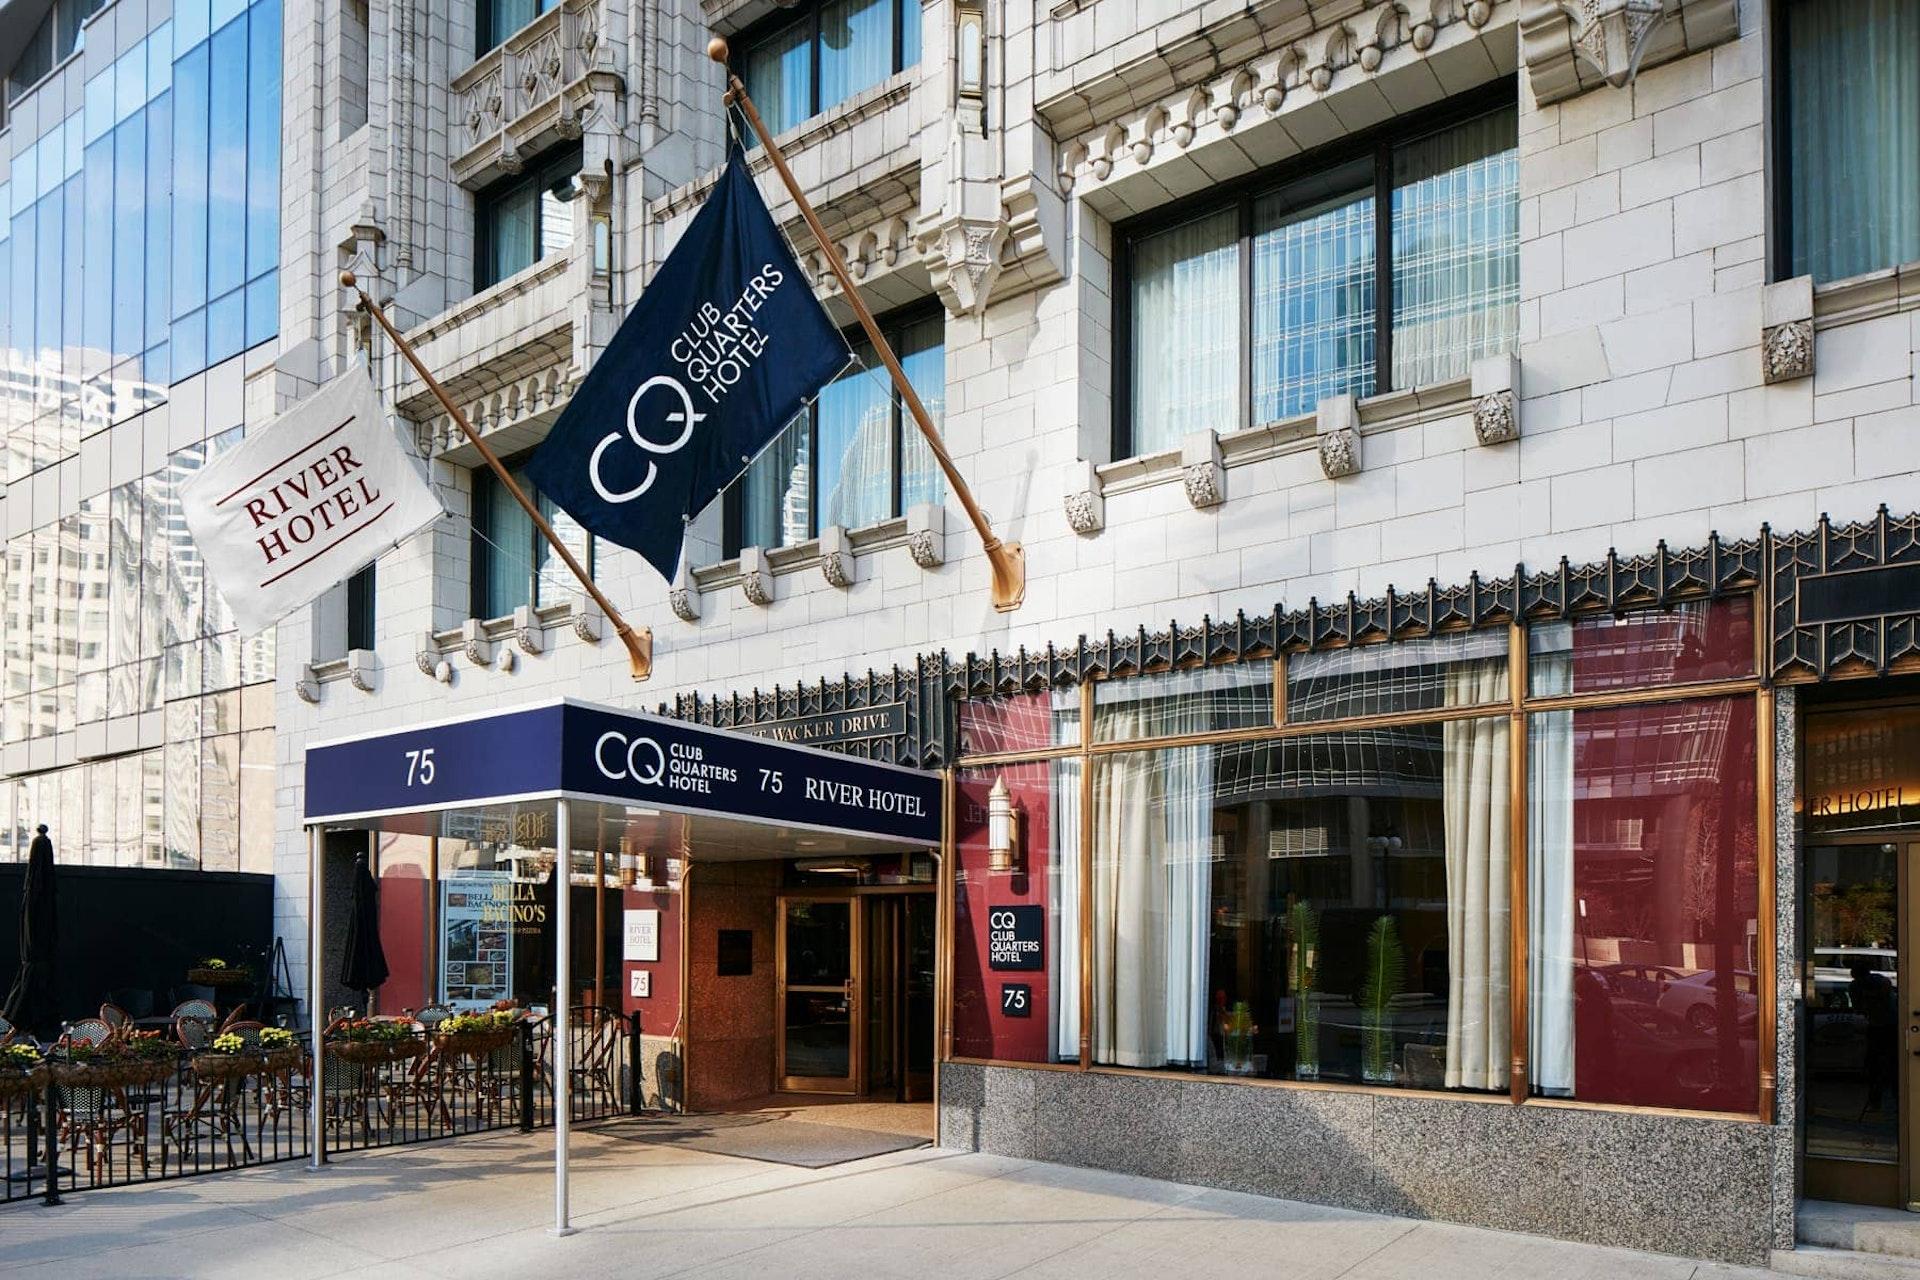 Exterior of CQ Hotel, Wacker at Michigan, Chicago